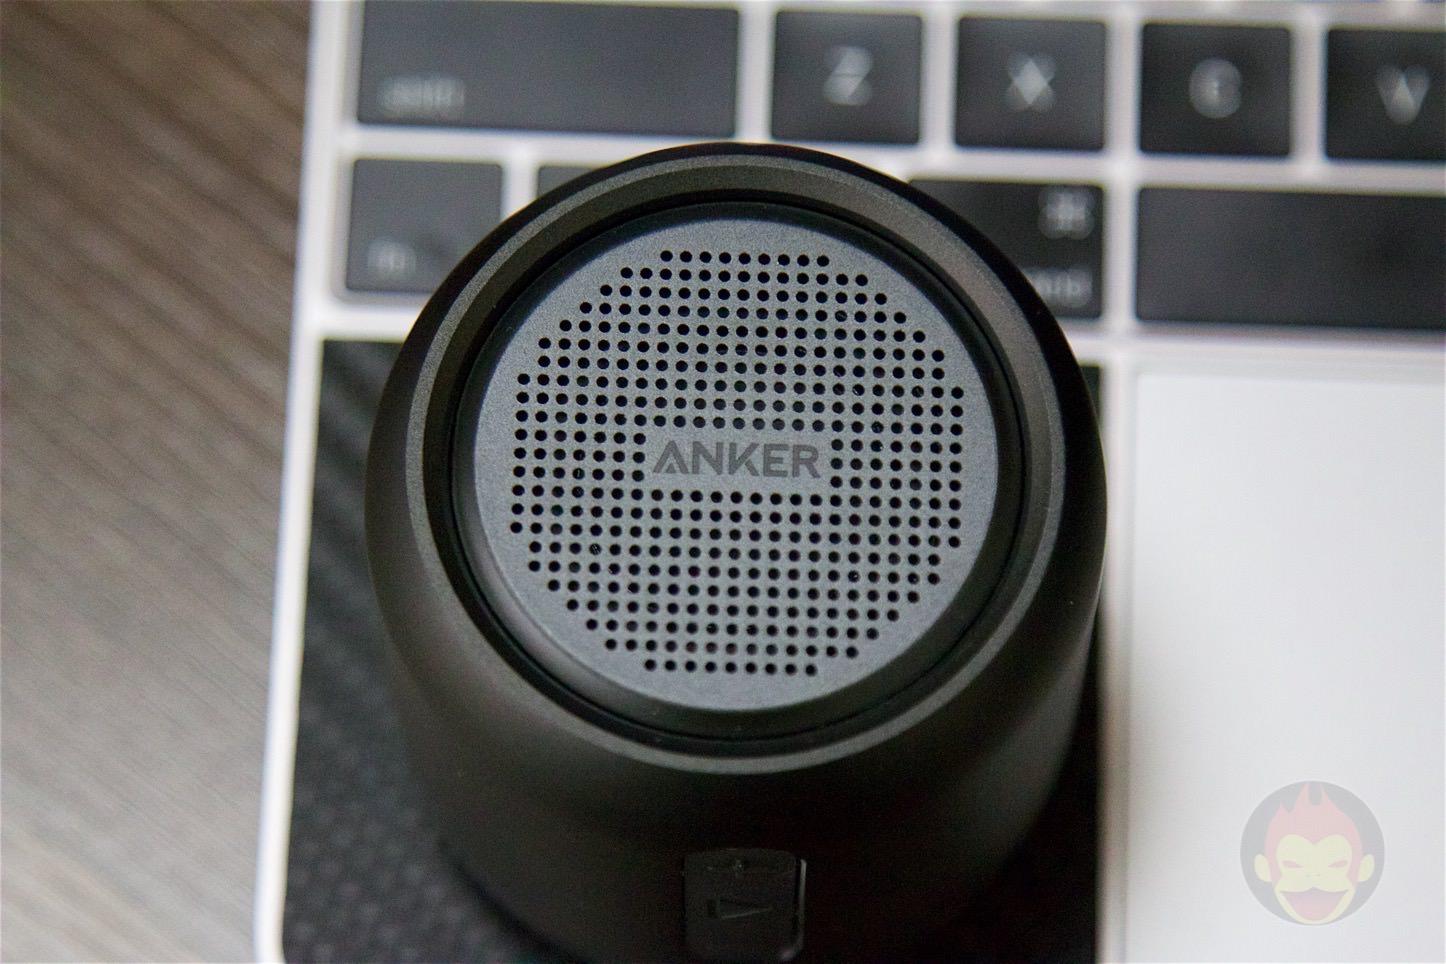 Anker-SoundCore-Mini-02.jpg